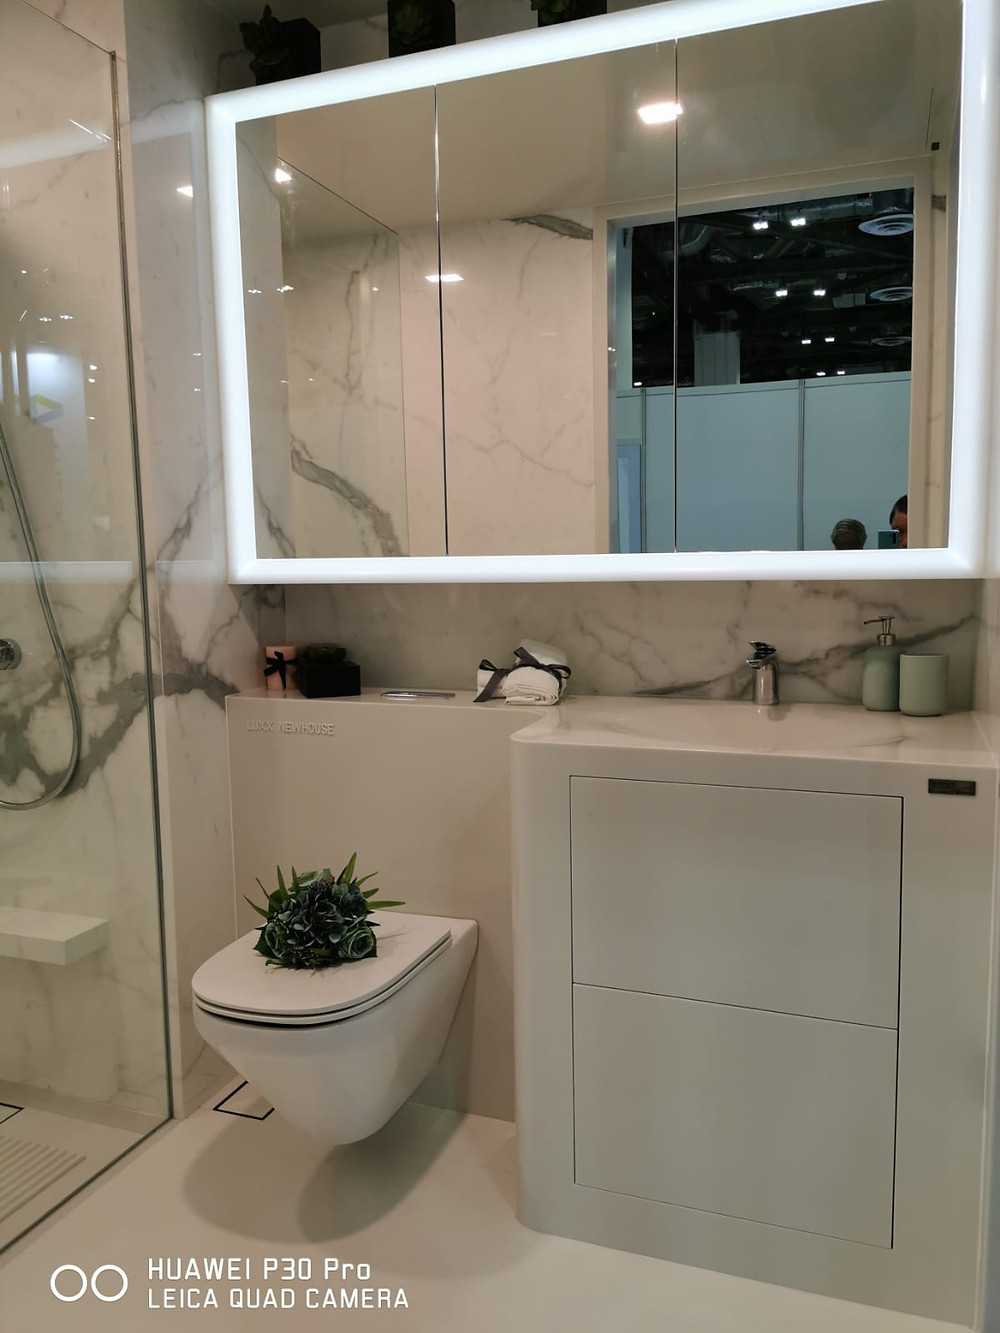 Pbath Vanity Top by Luxx Newhouse Group @ IBEW2019